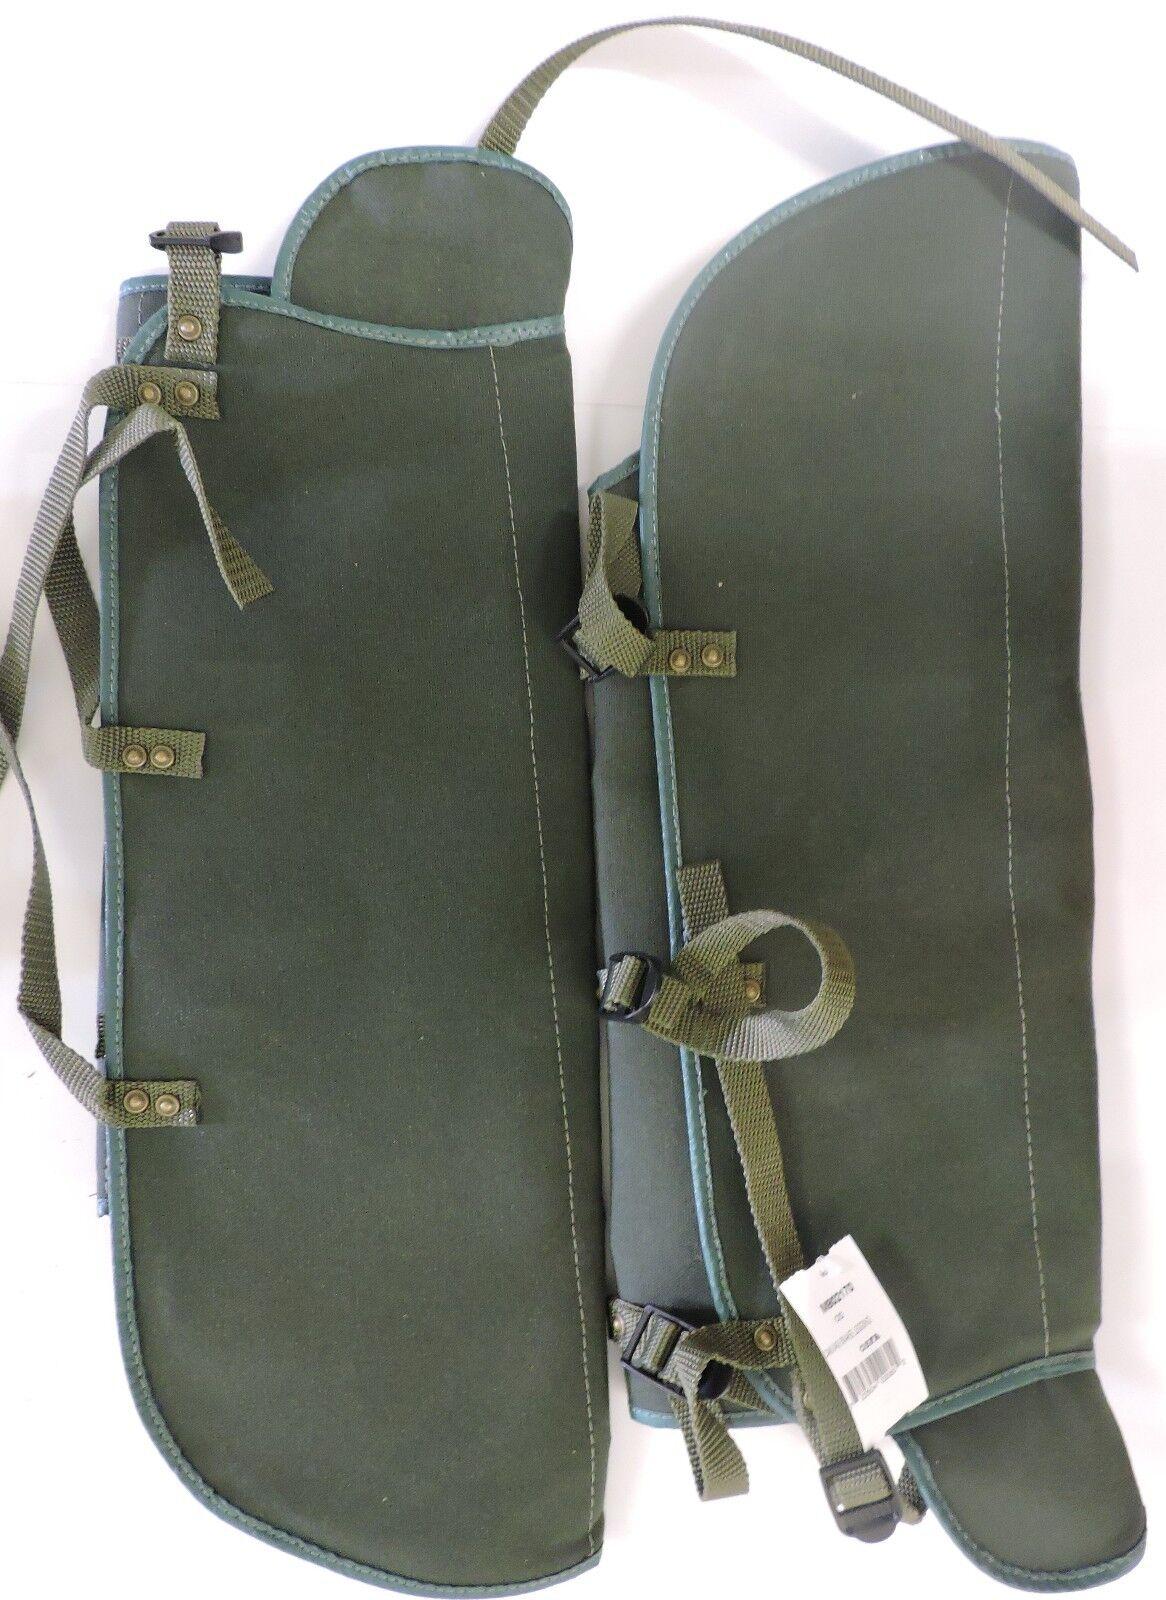 M802170 Wire Mesh Snakeproof Leggings Pair Snake Chaps Gaiters Olive 1 Pair Leggings f5f82b